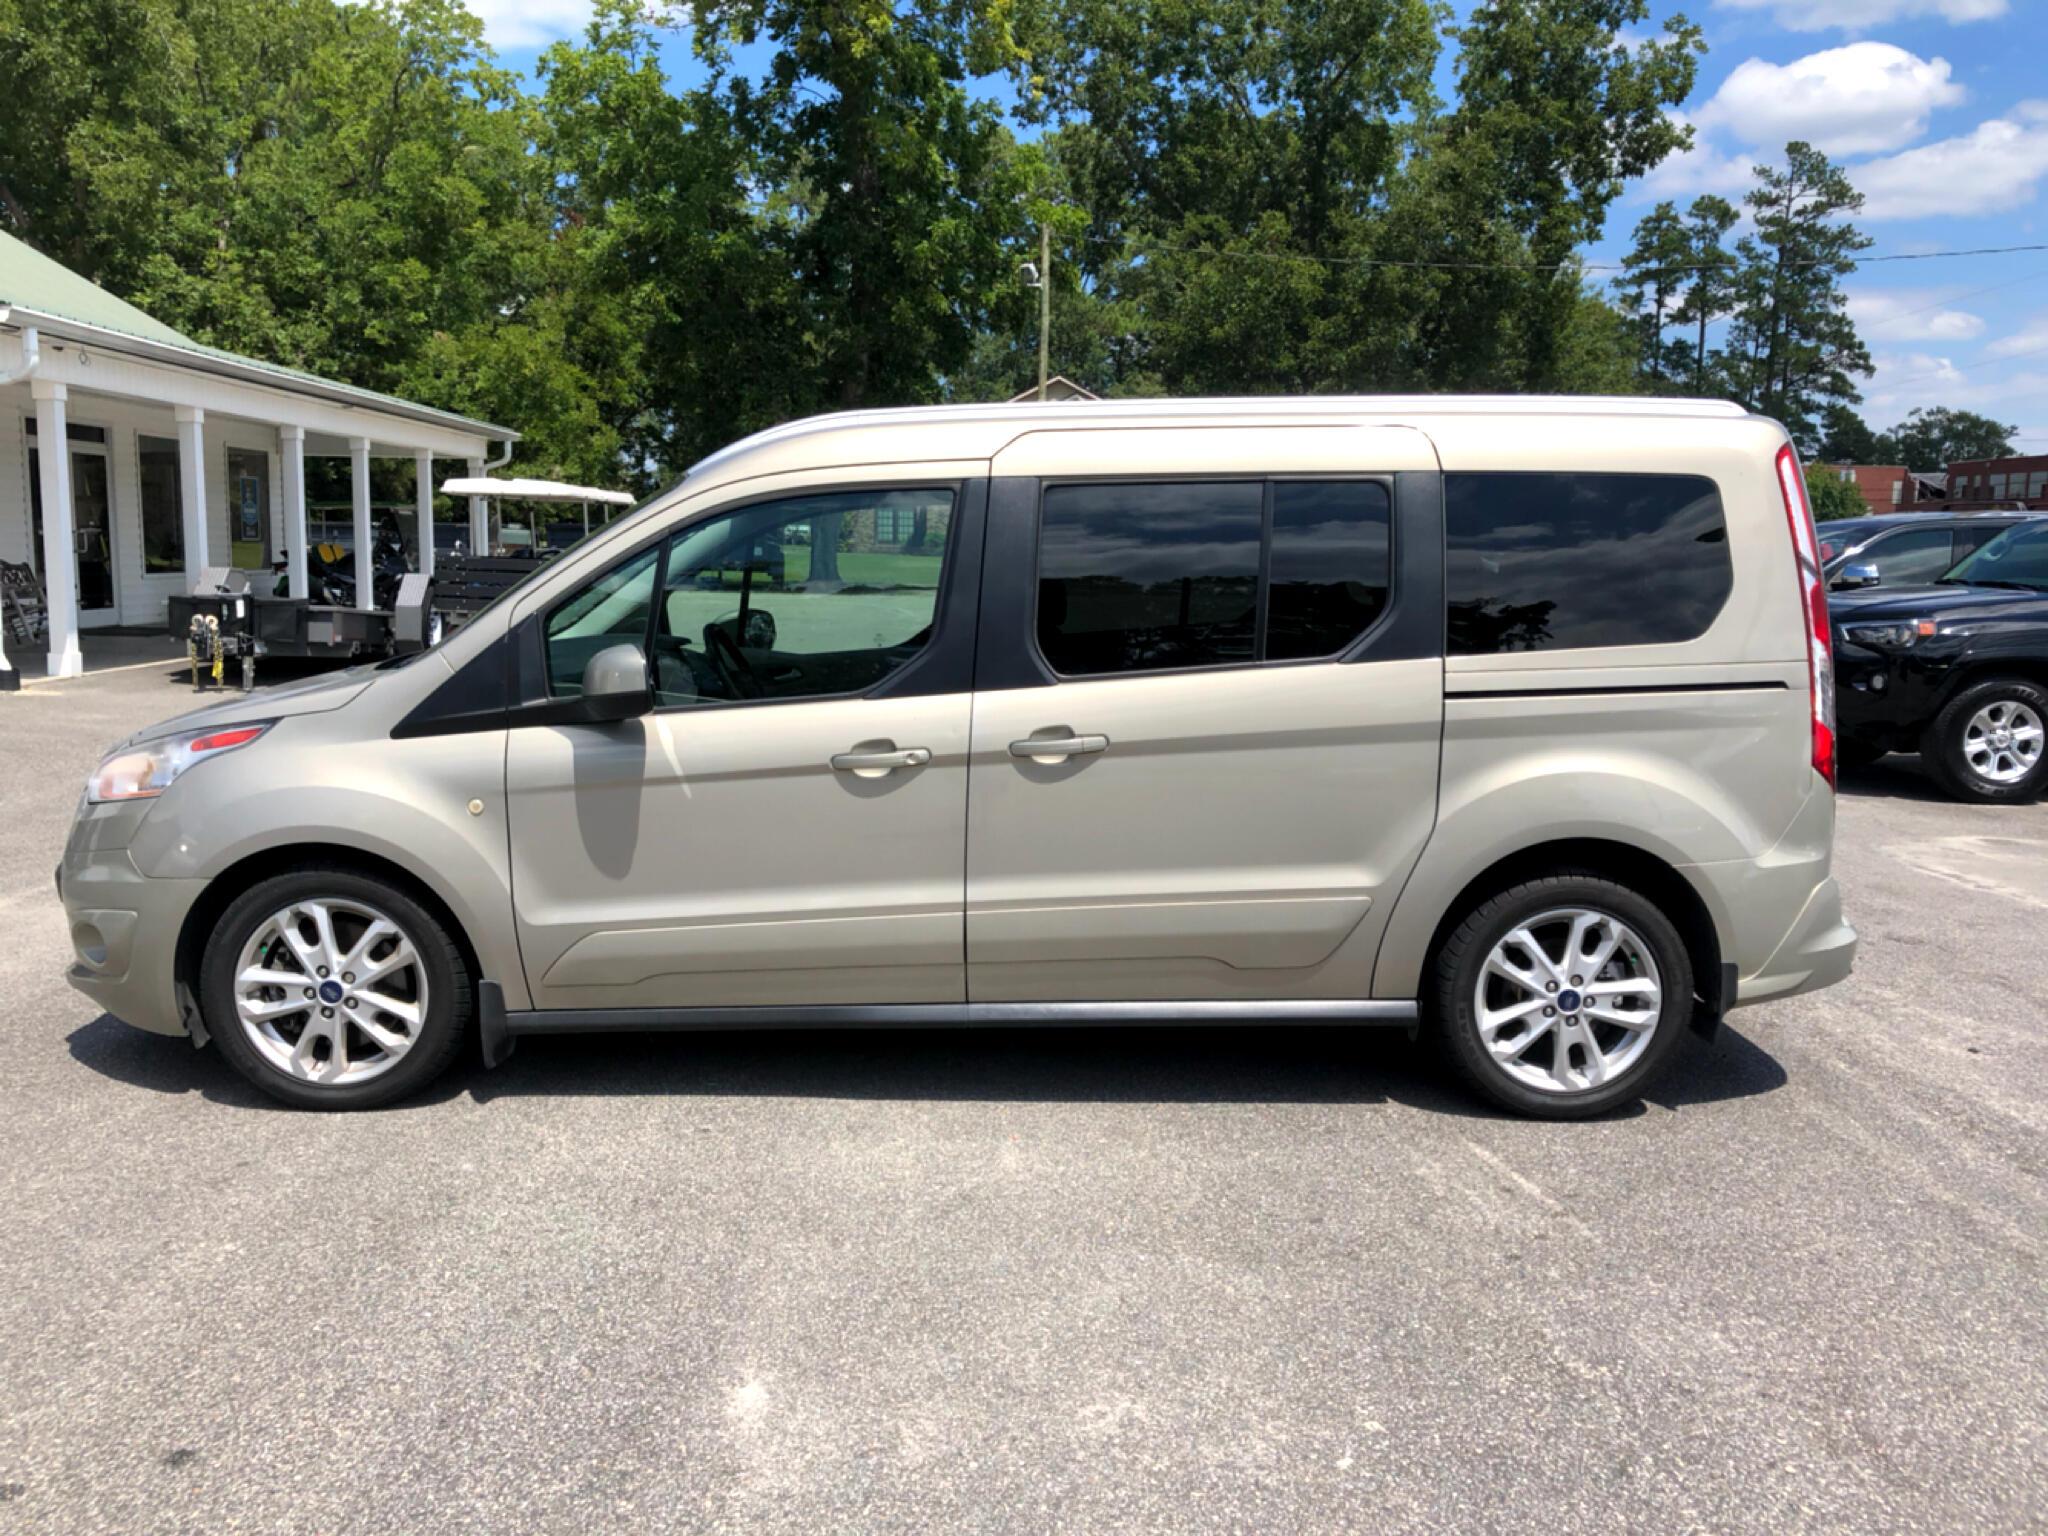 Ford Transit Connect Wagon 4dr Wgn LWB Titanium w/Rear Liftgate 2016